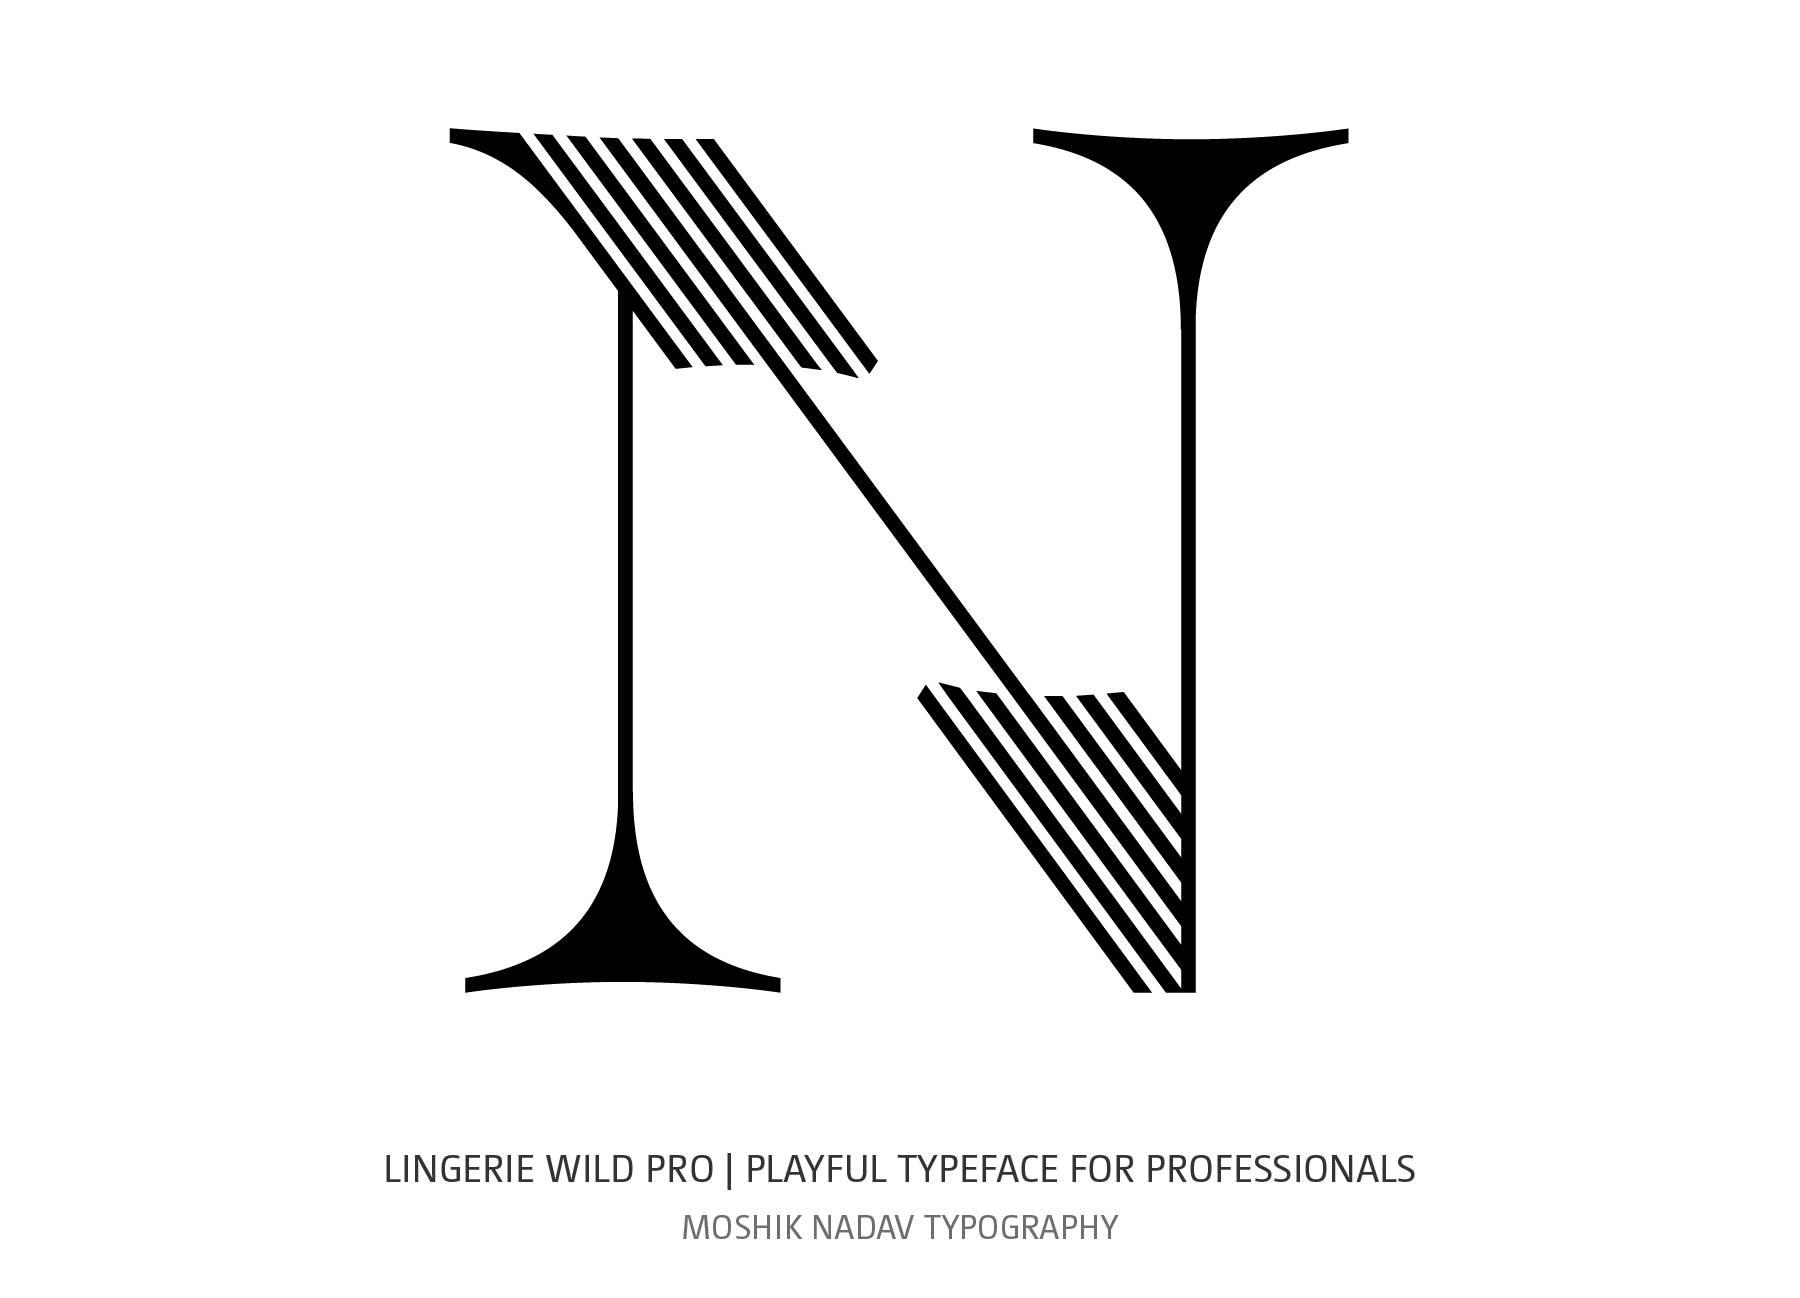 Lingerie Wild Pro Typeface uppercase N designed by Moshik Nadav Fashion Typography